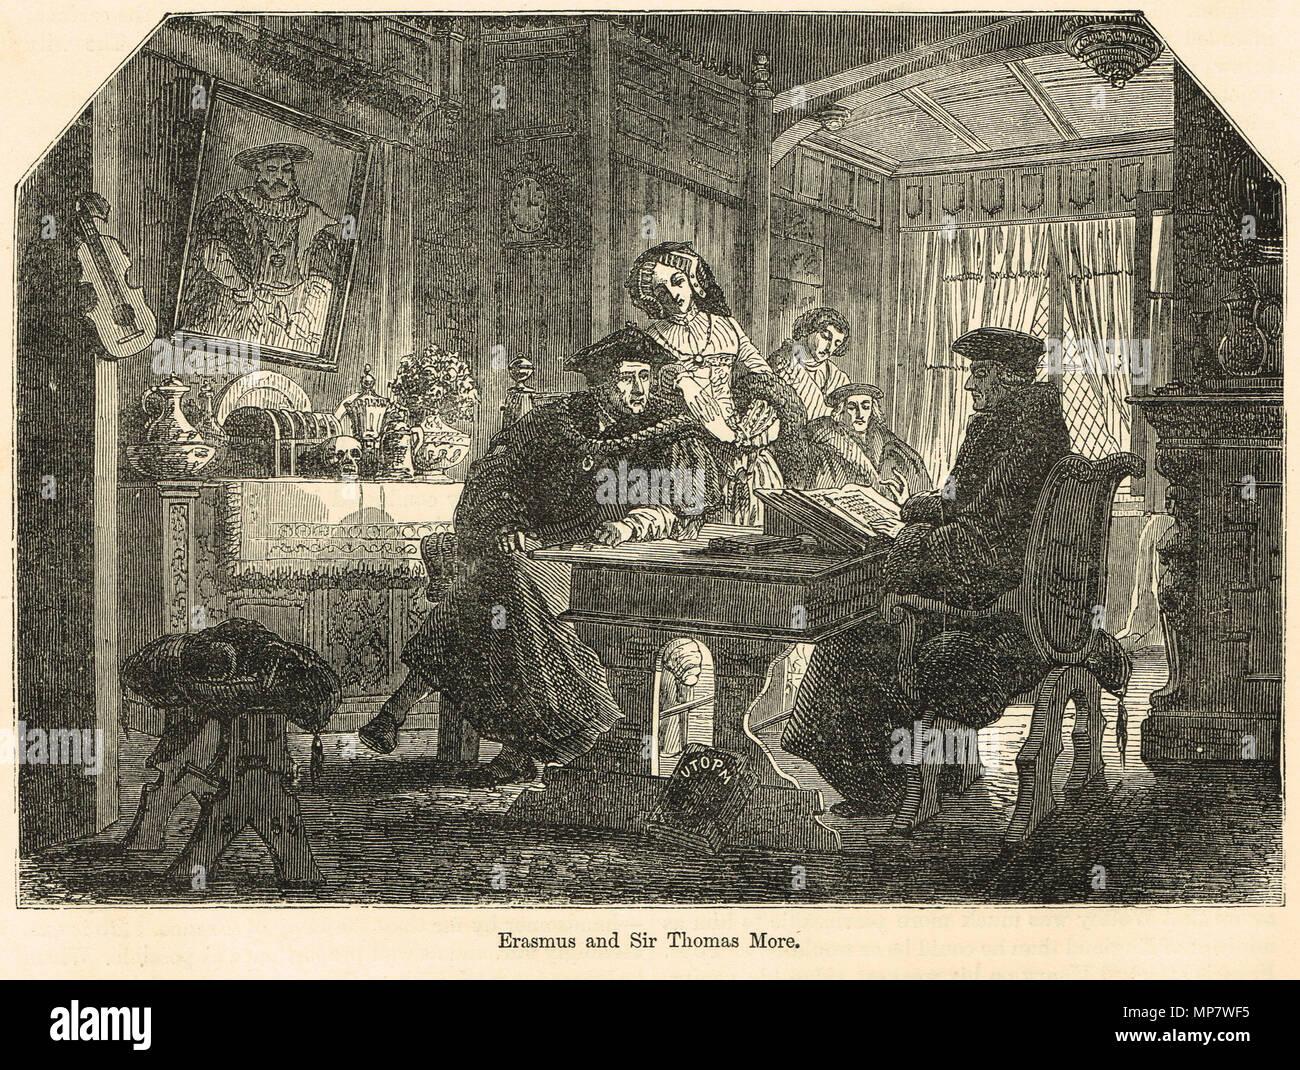 Meeting of Erasmus and Sir Thomas Moore - Stock Image